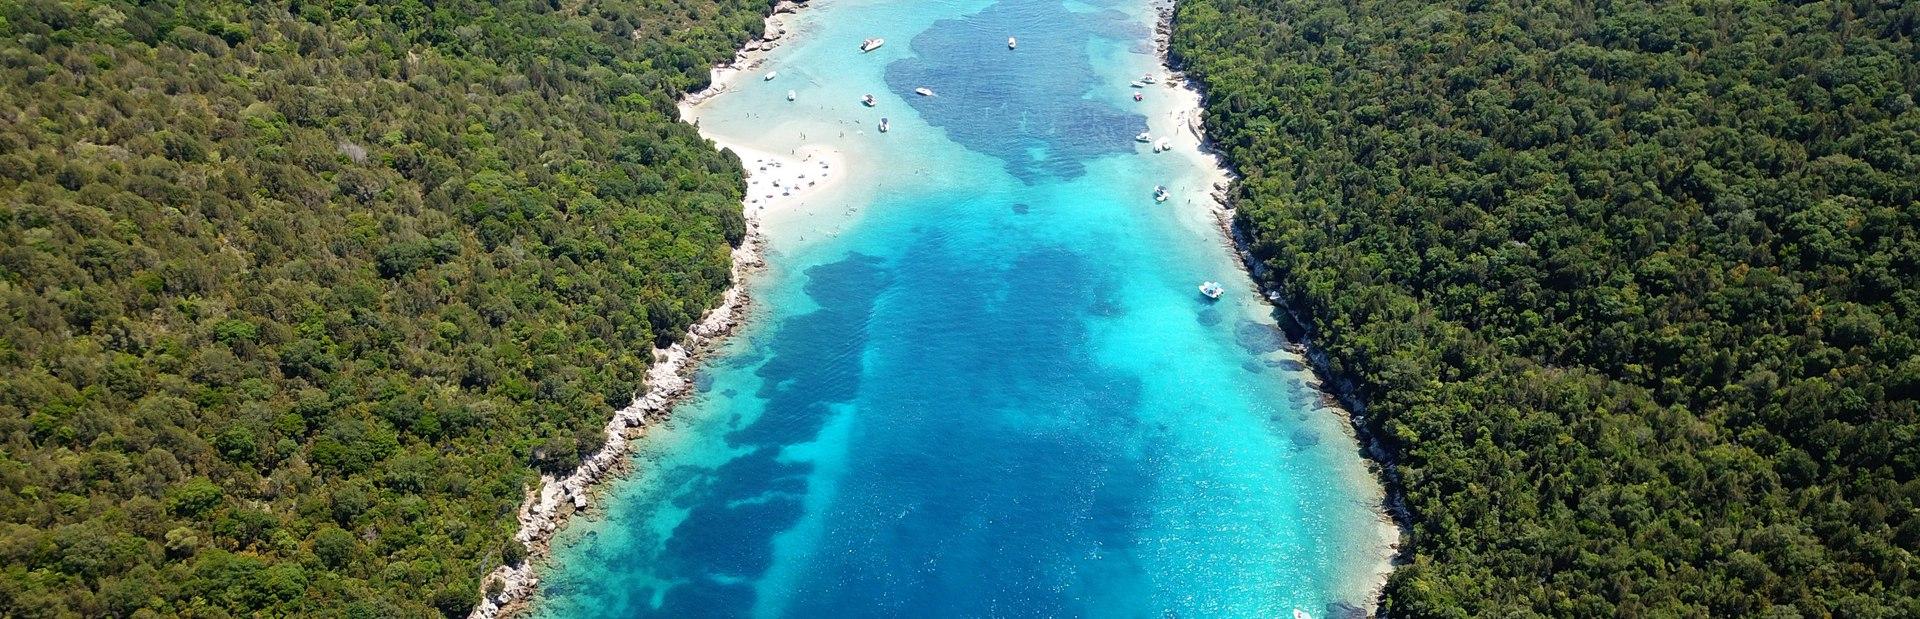 Rum Cay photo tour